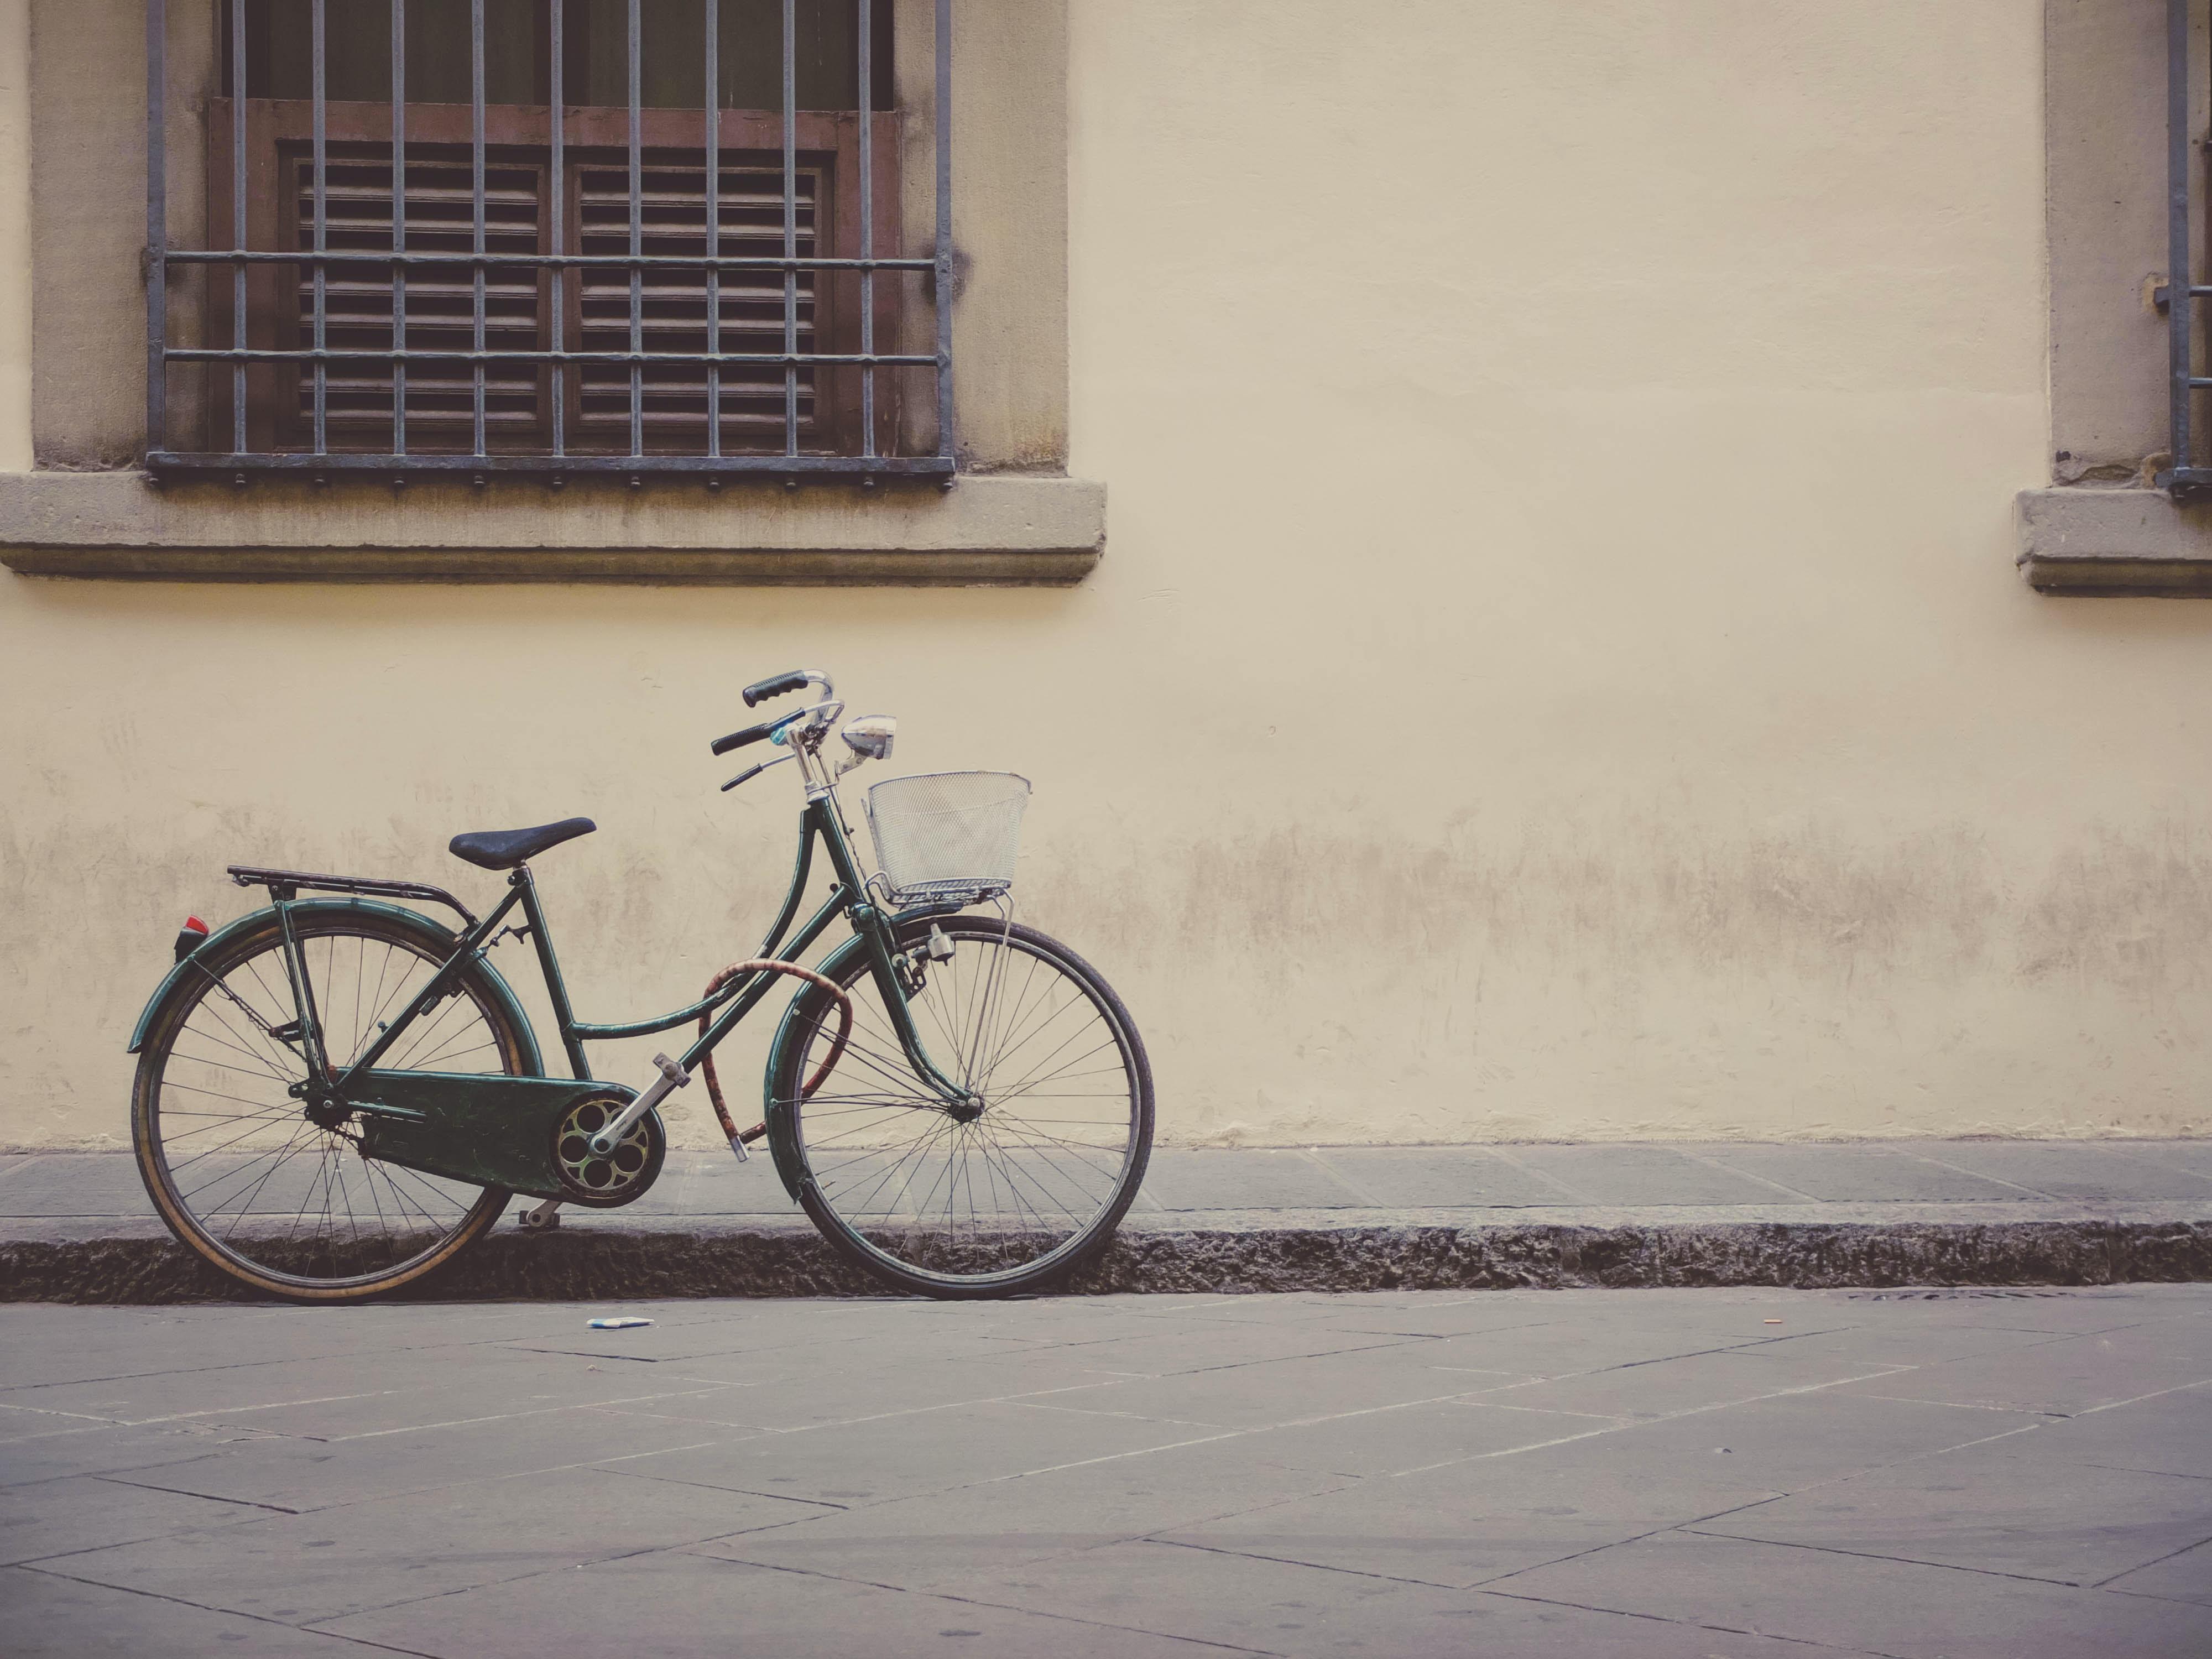 black step-through bike